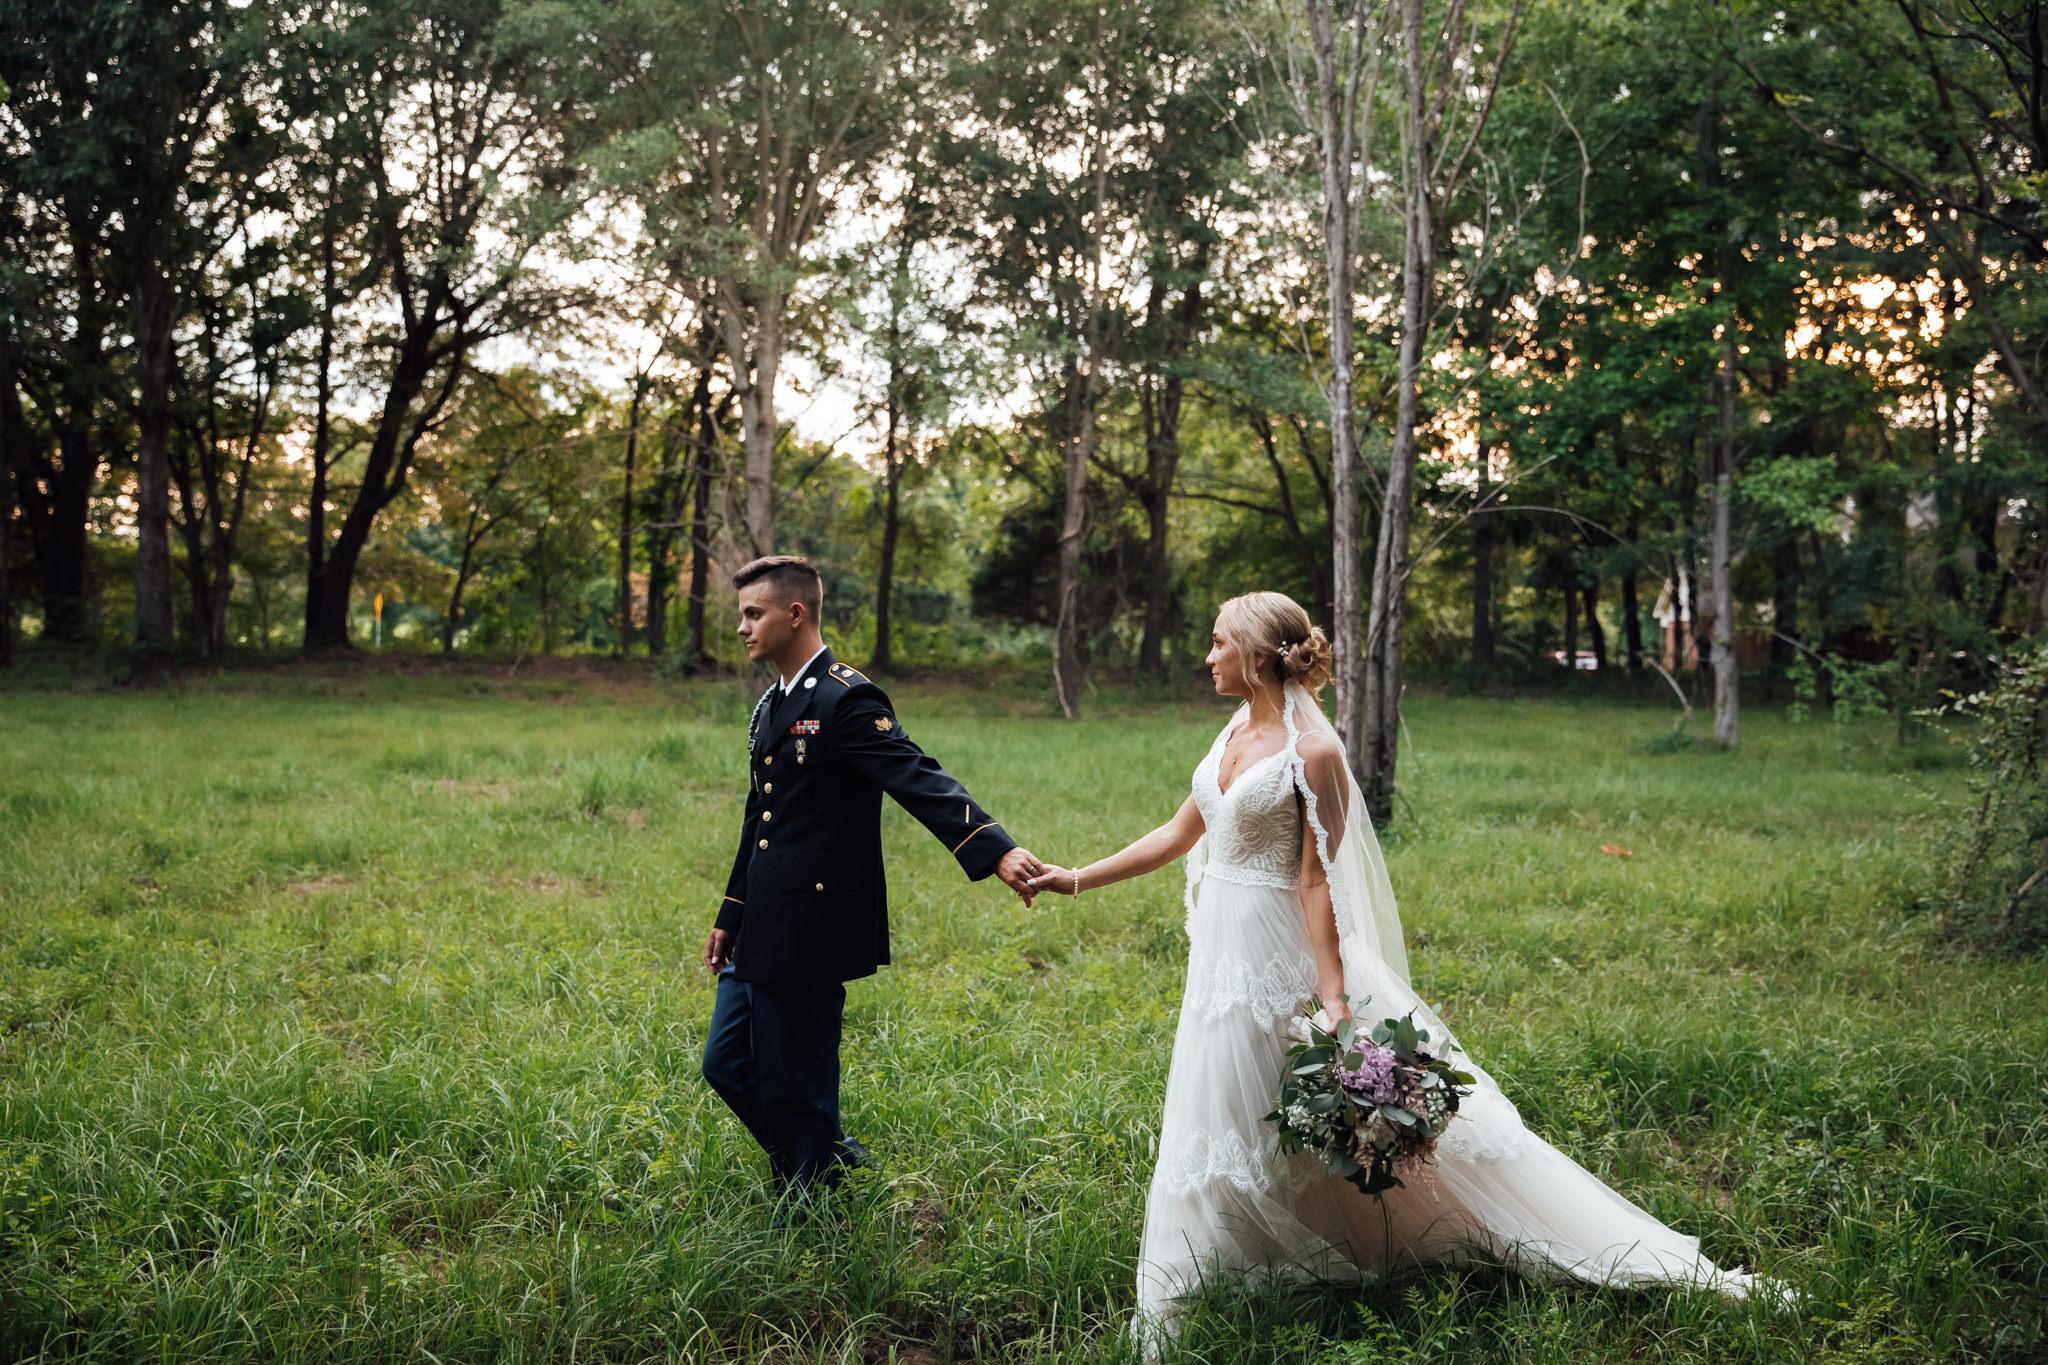 backyard-wedding-thewarmtharoundyou-lexy-branson-73.jpg